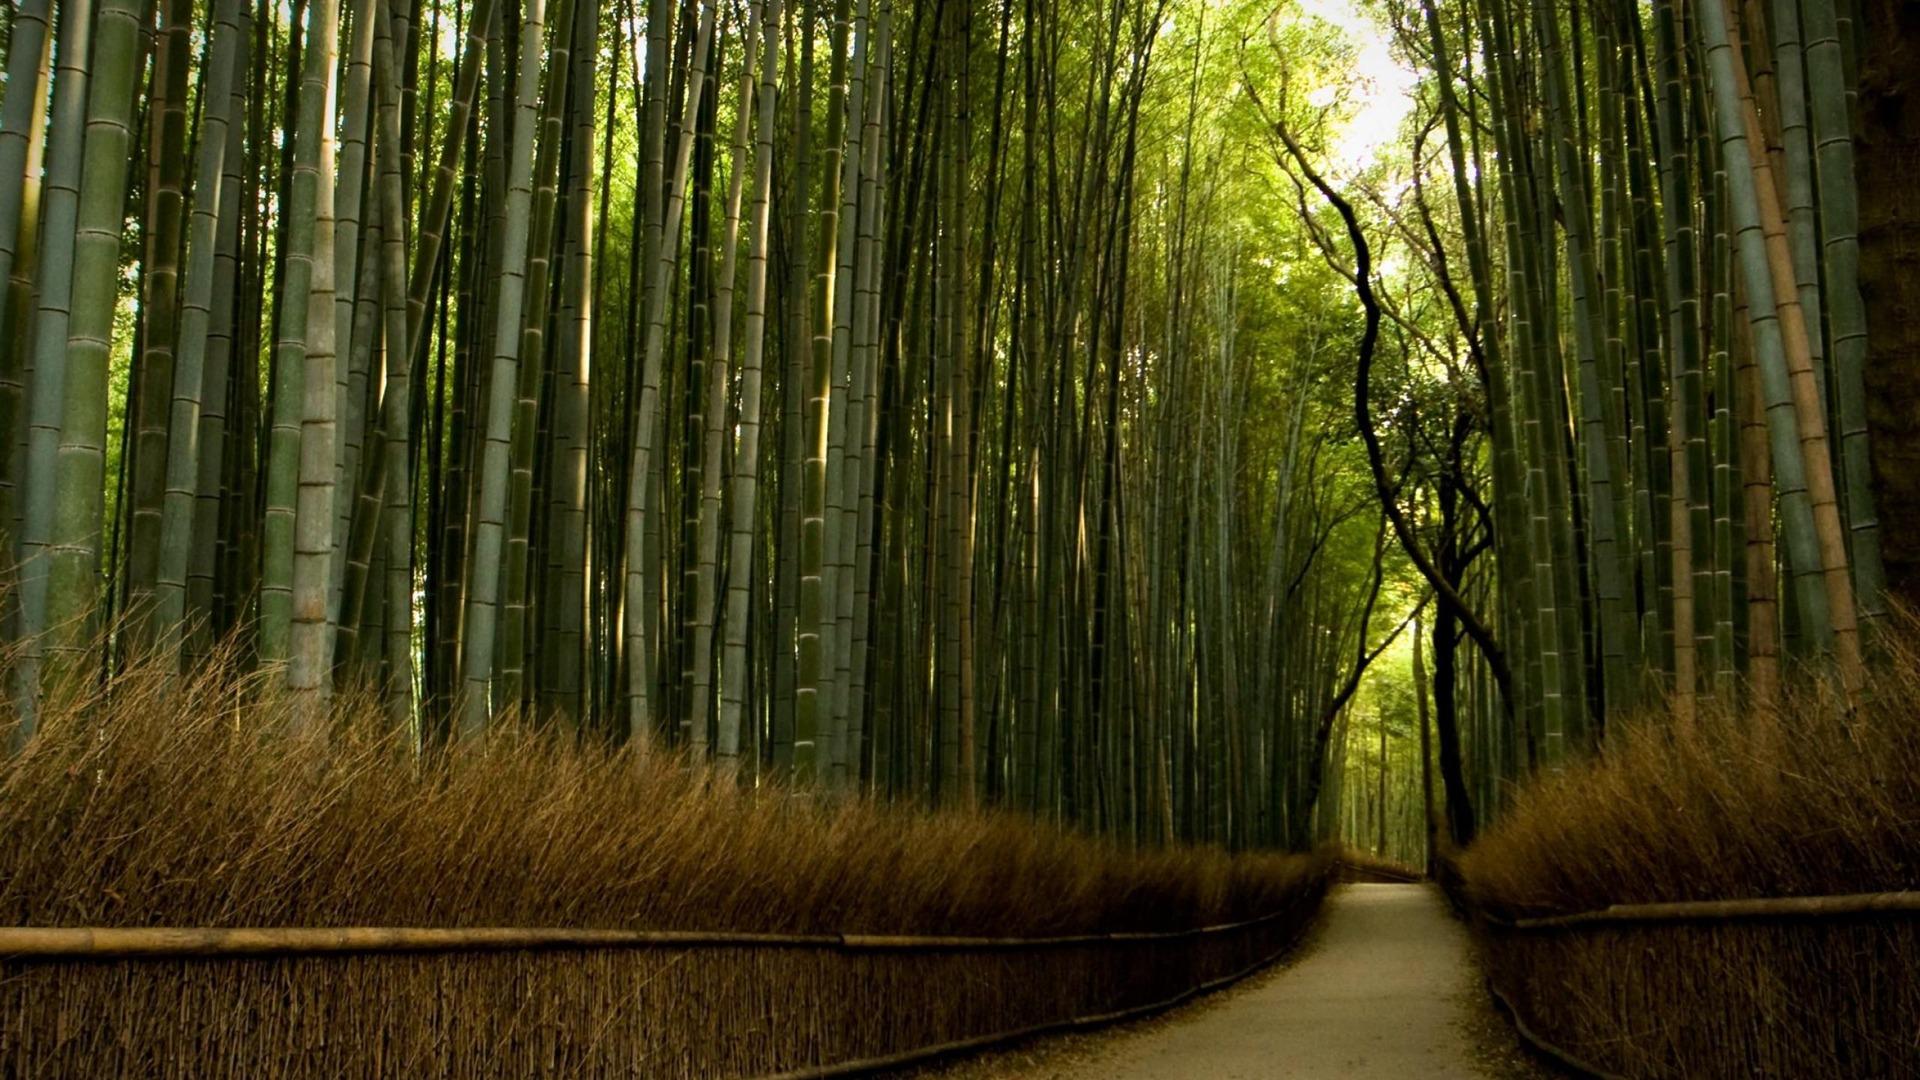 1080 x 1920 illusion wallpaper: 竹の森-高品質デスクトップ壁紙プレビュー